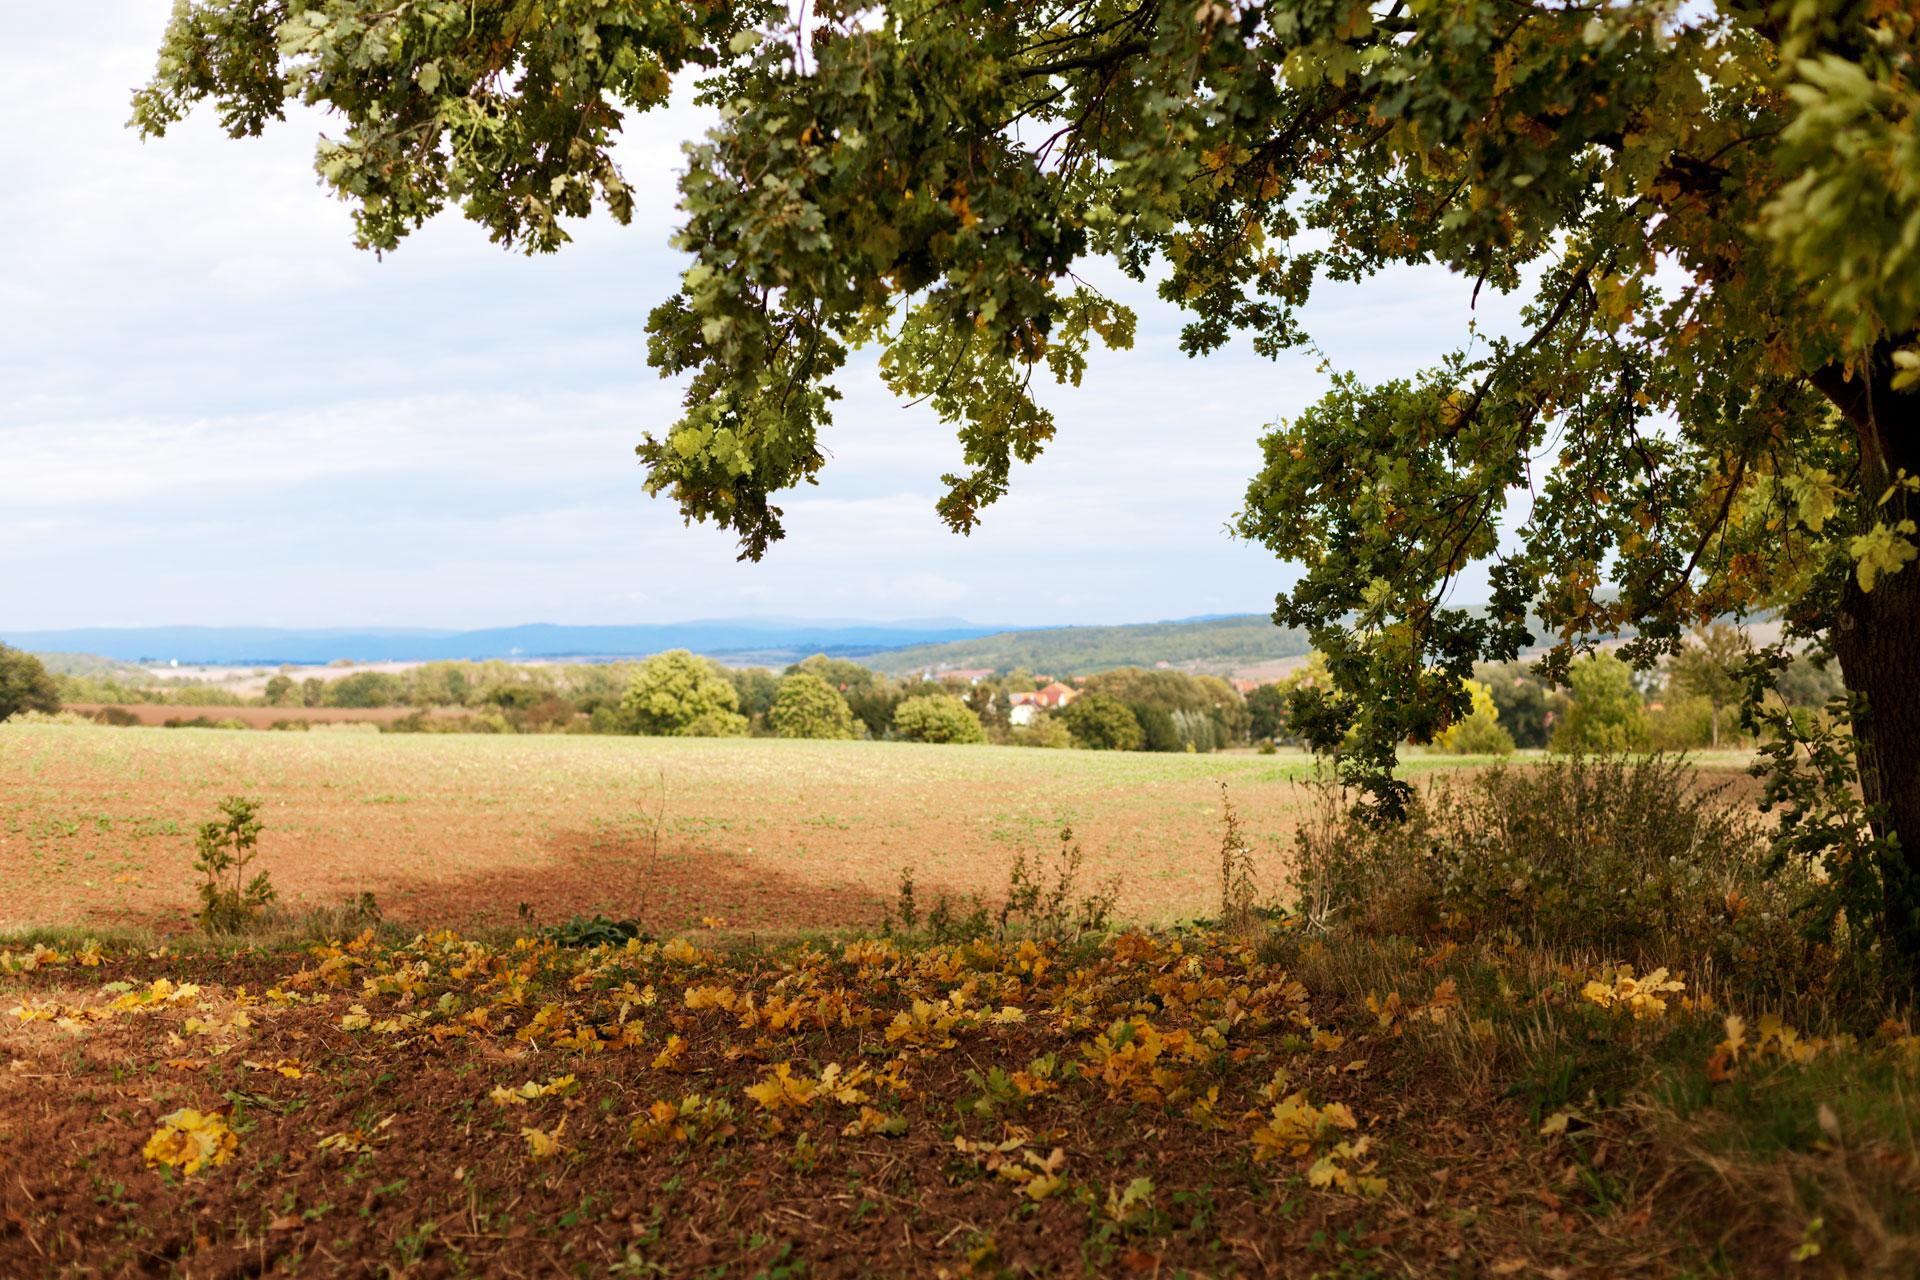 Timo_Stammberger_Duderstadt_Landscape_Forerest_Wald_Acker_Herbst_Sommer